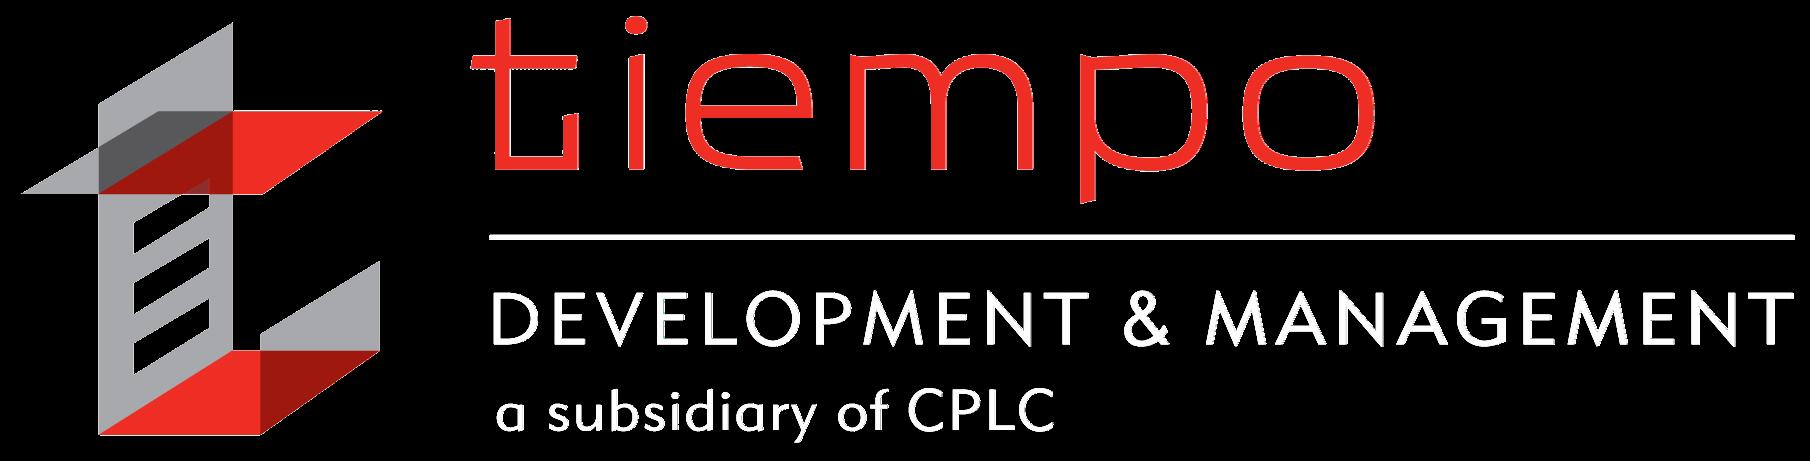 Peoria Property Logo 18